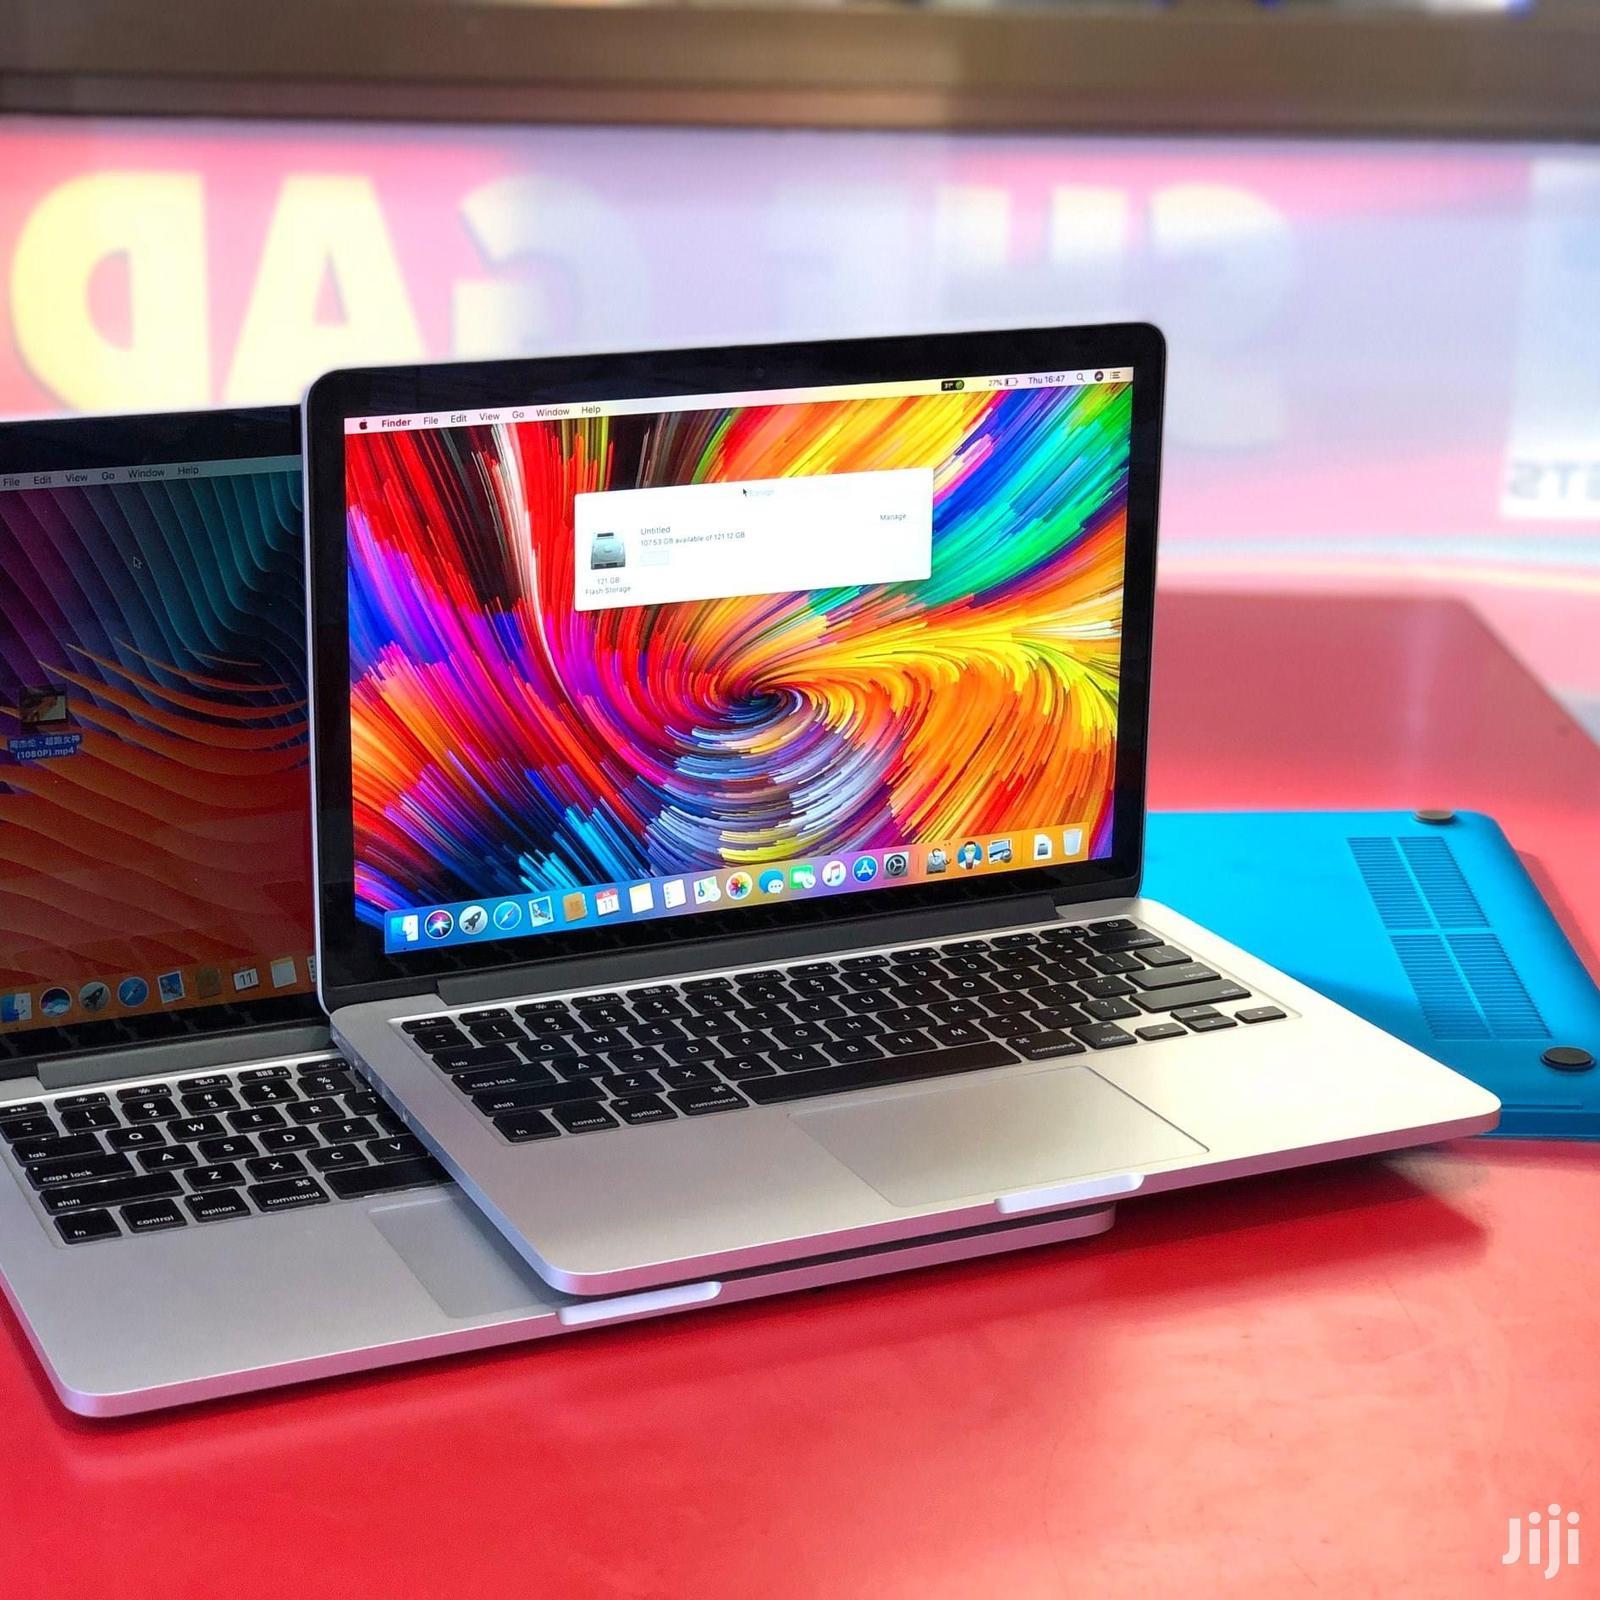 Archive: Laptop Apple MacBook Pro 8GB Intel Core I5 SSD 128GB